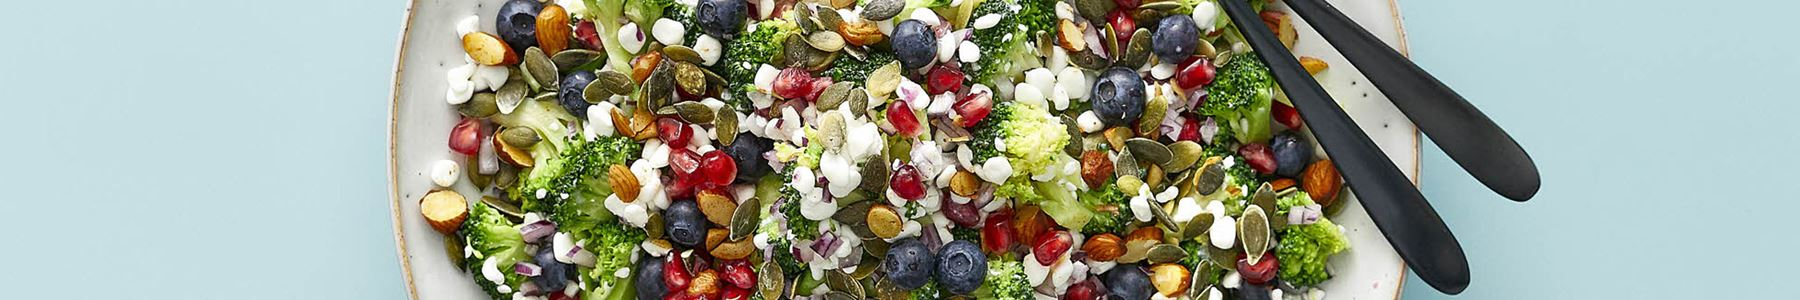 Blåbær + Salater